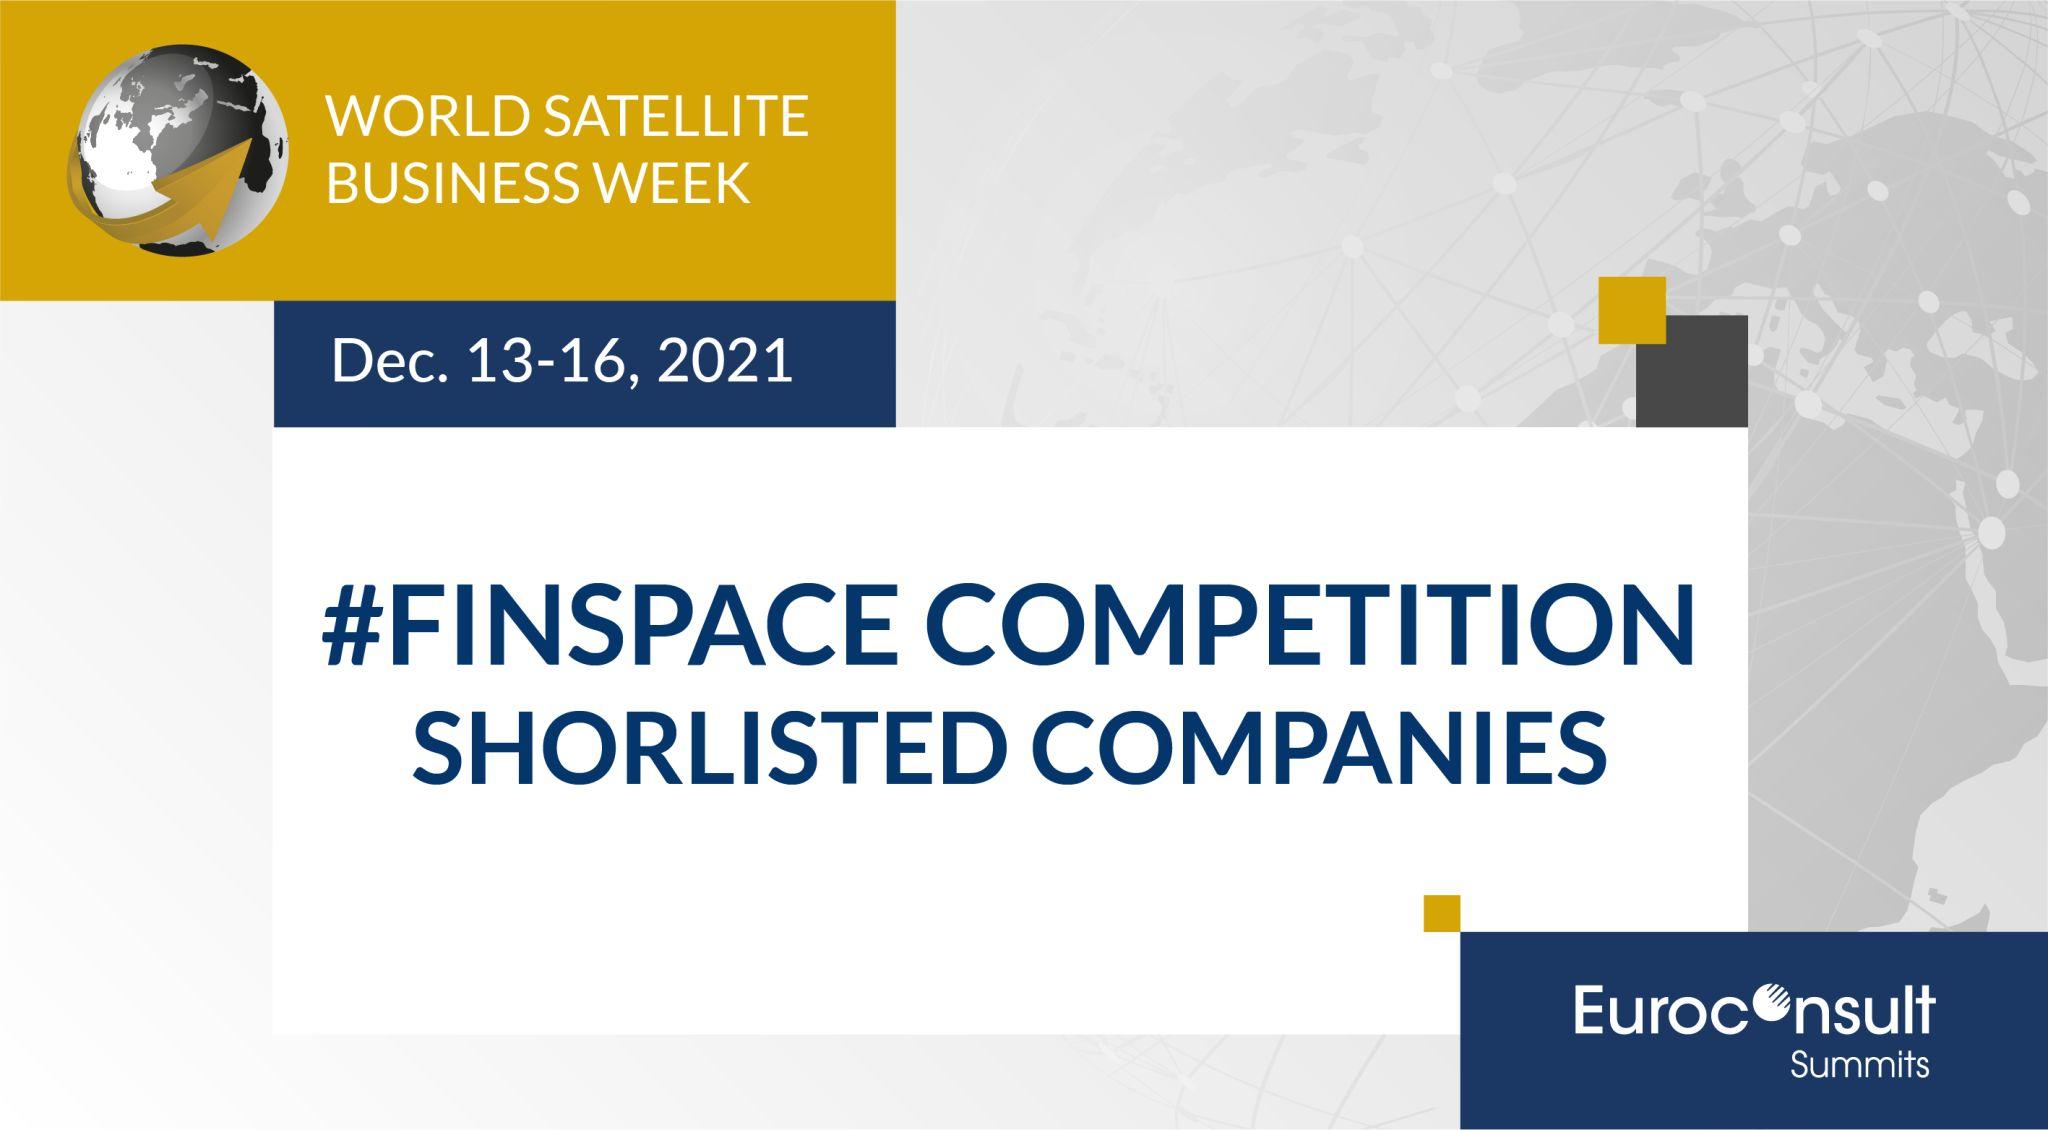 R3-IoT finalist in World Satellite Business Week Finspace awards